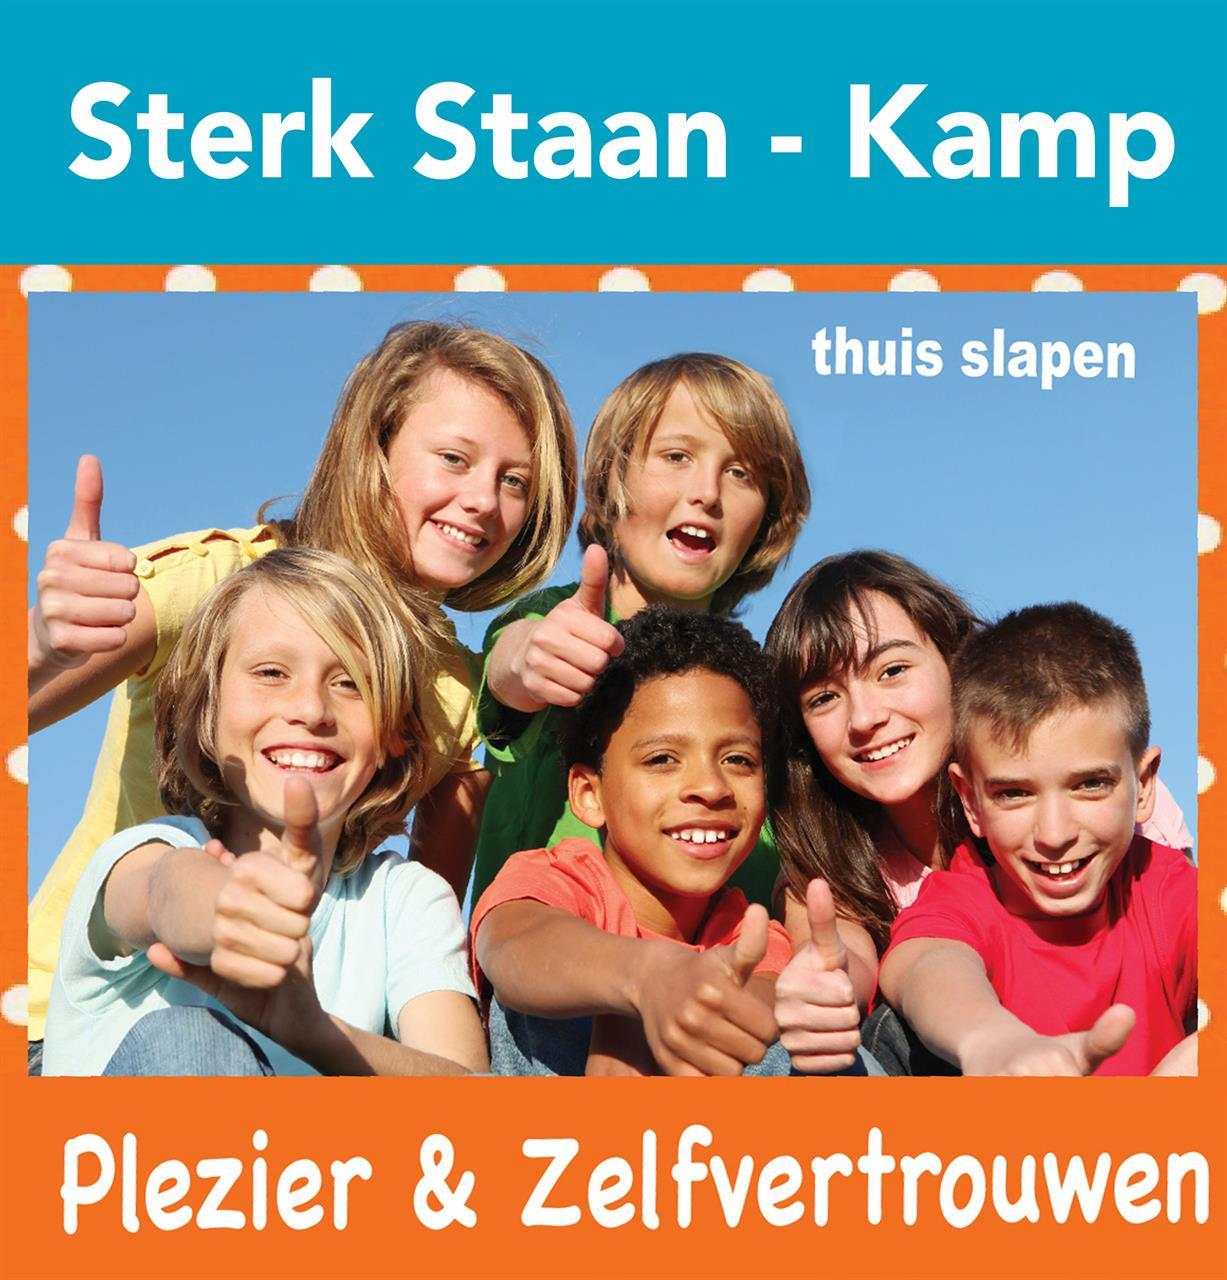 Sta Sterk kamp - 5 dagen in de mei en zomervakantie 2021